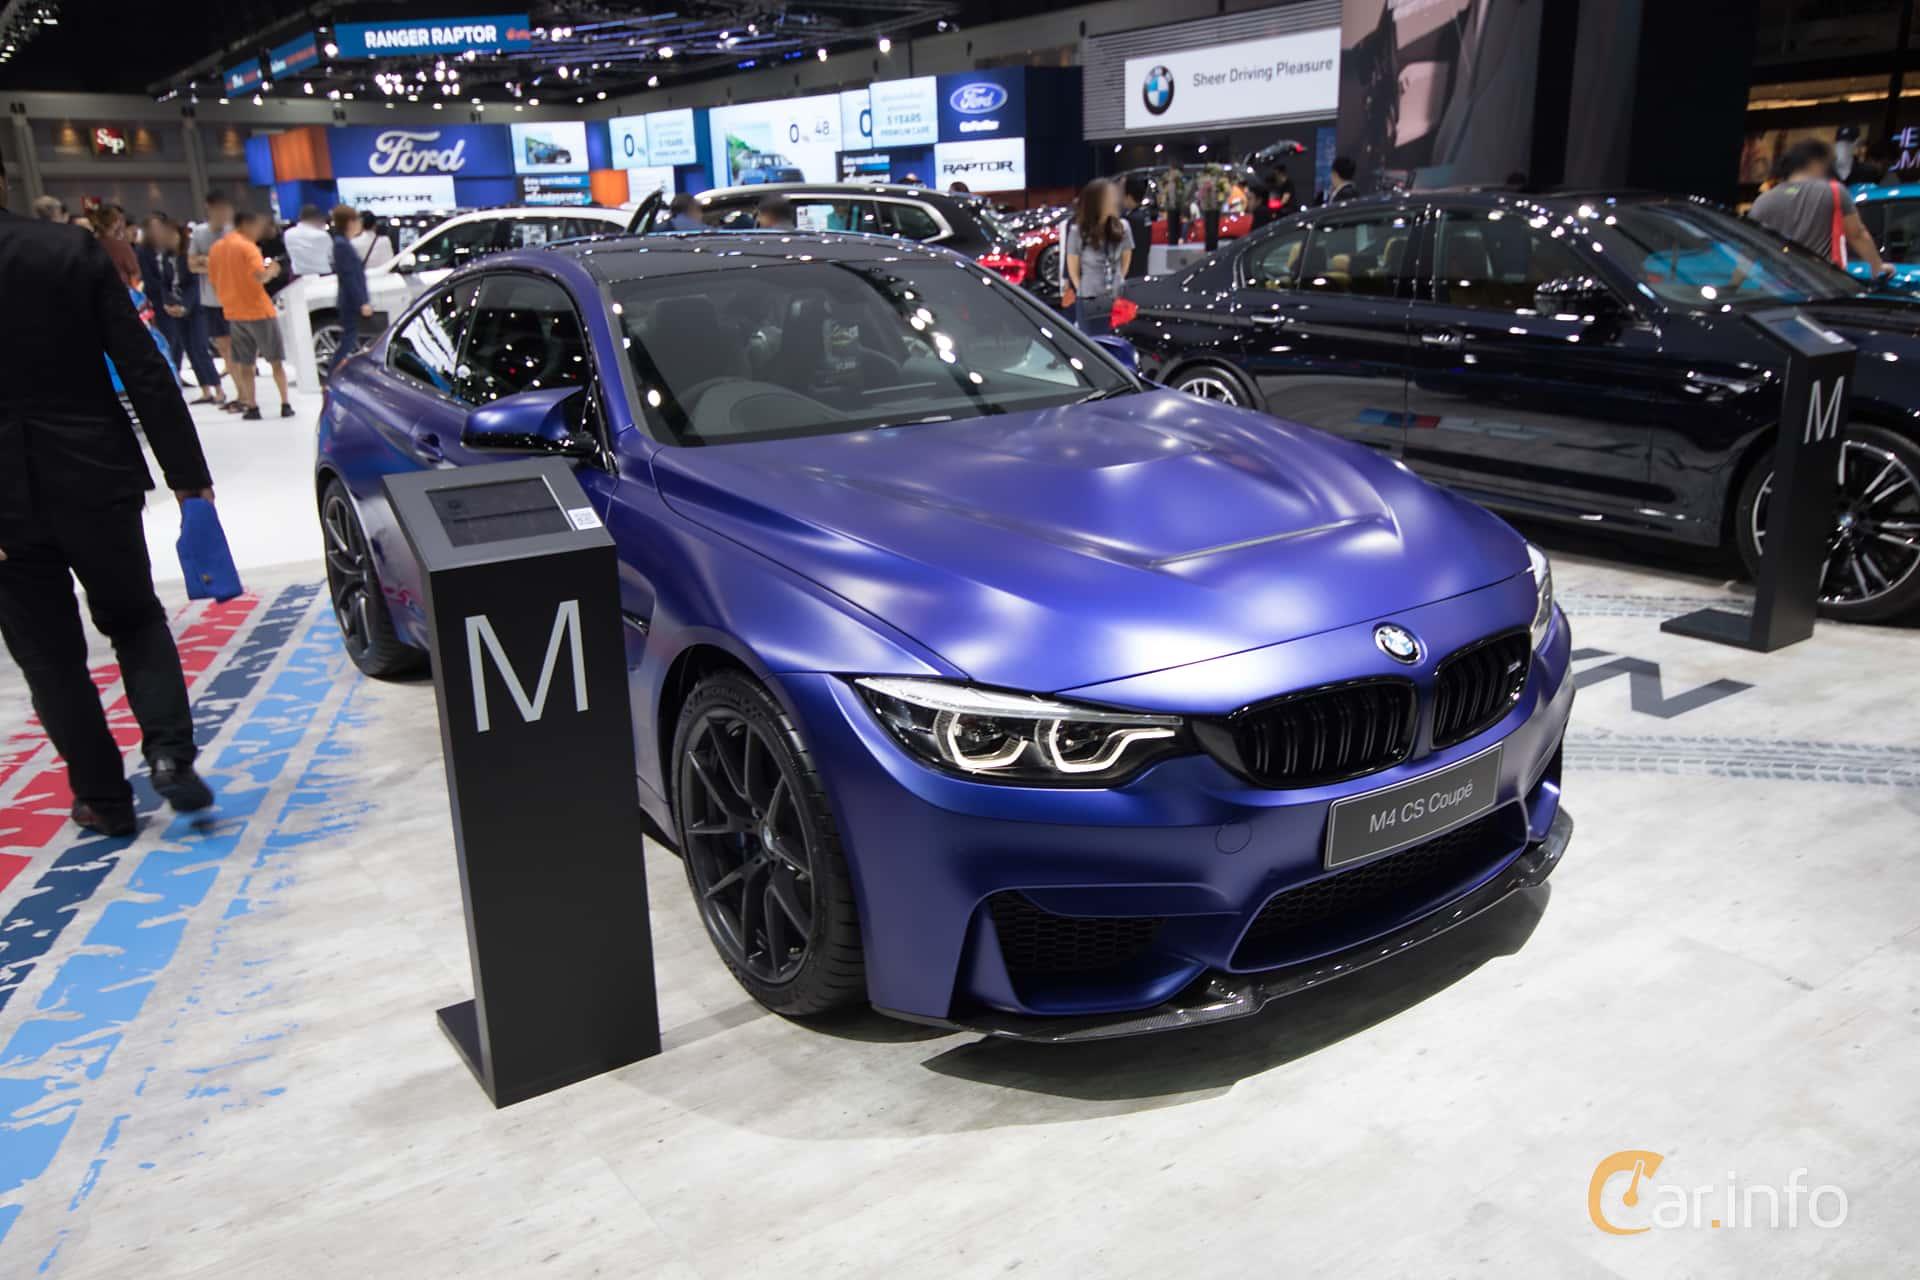 Front/Side  of BMW M4 CS  Drivelogic, 460ps, 2019 at Bangkok Motor Show 2019